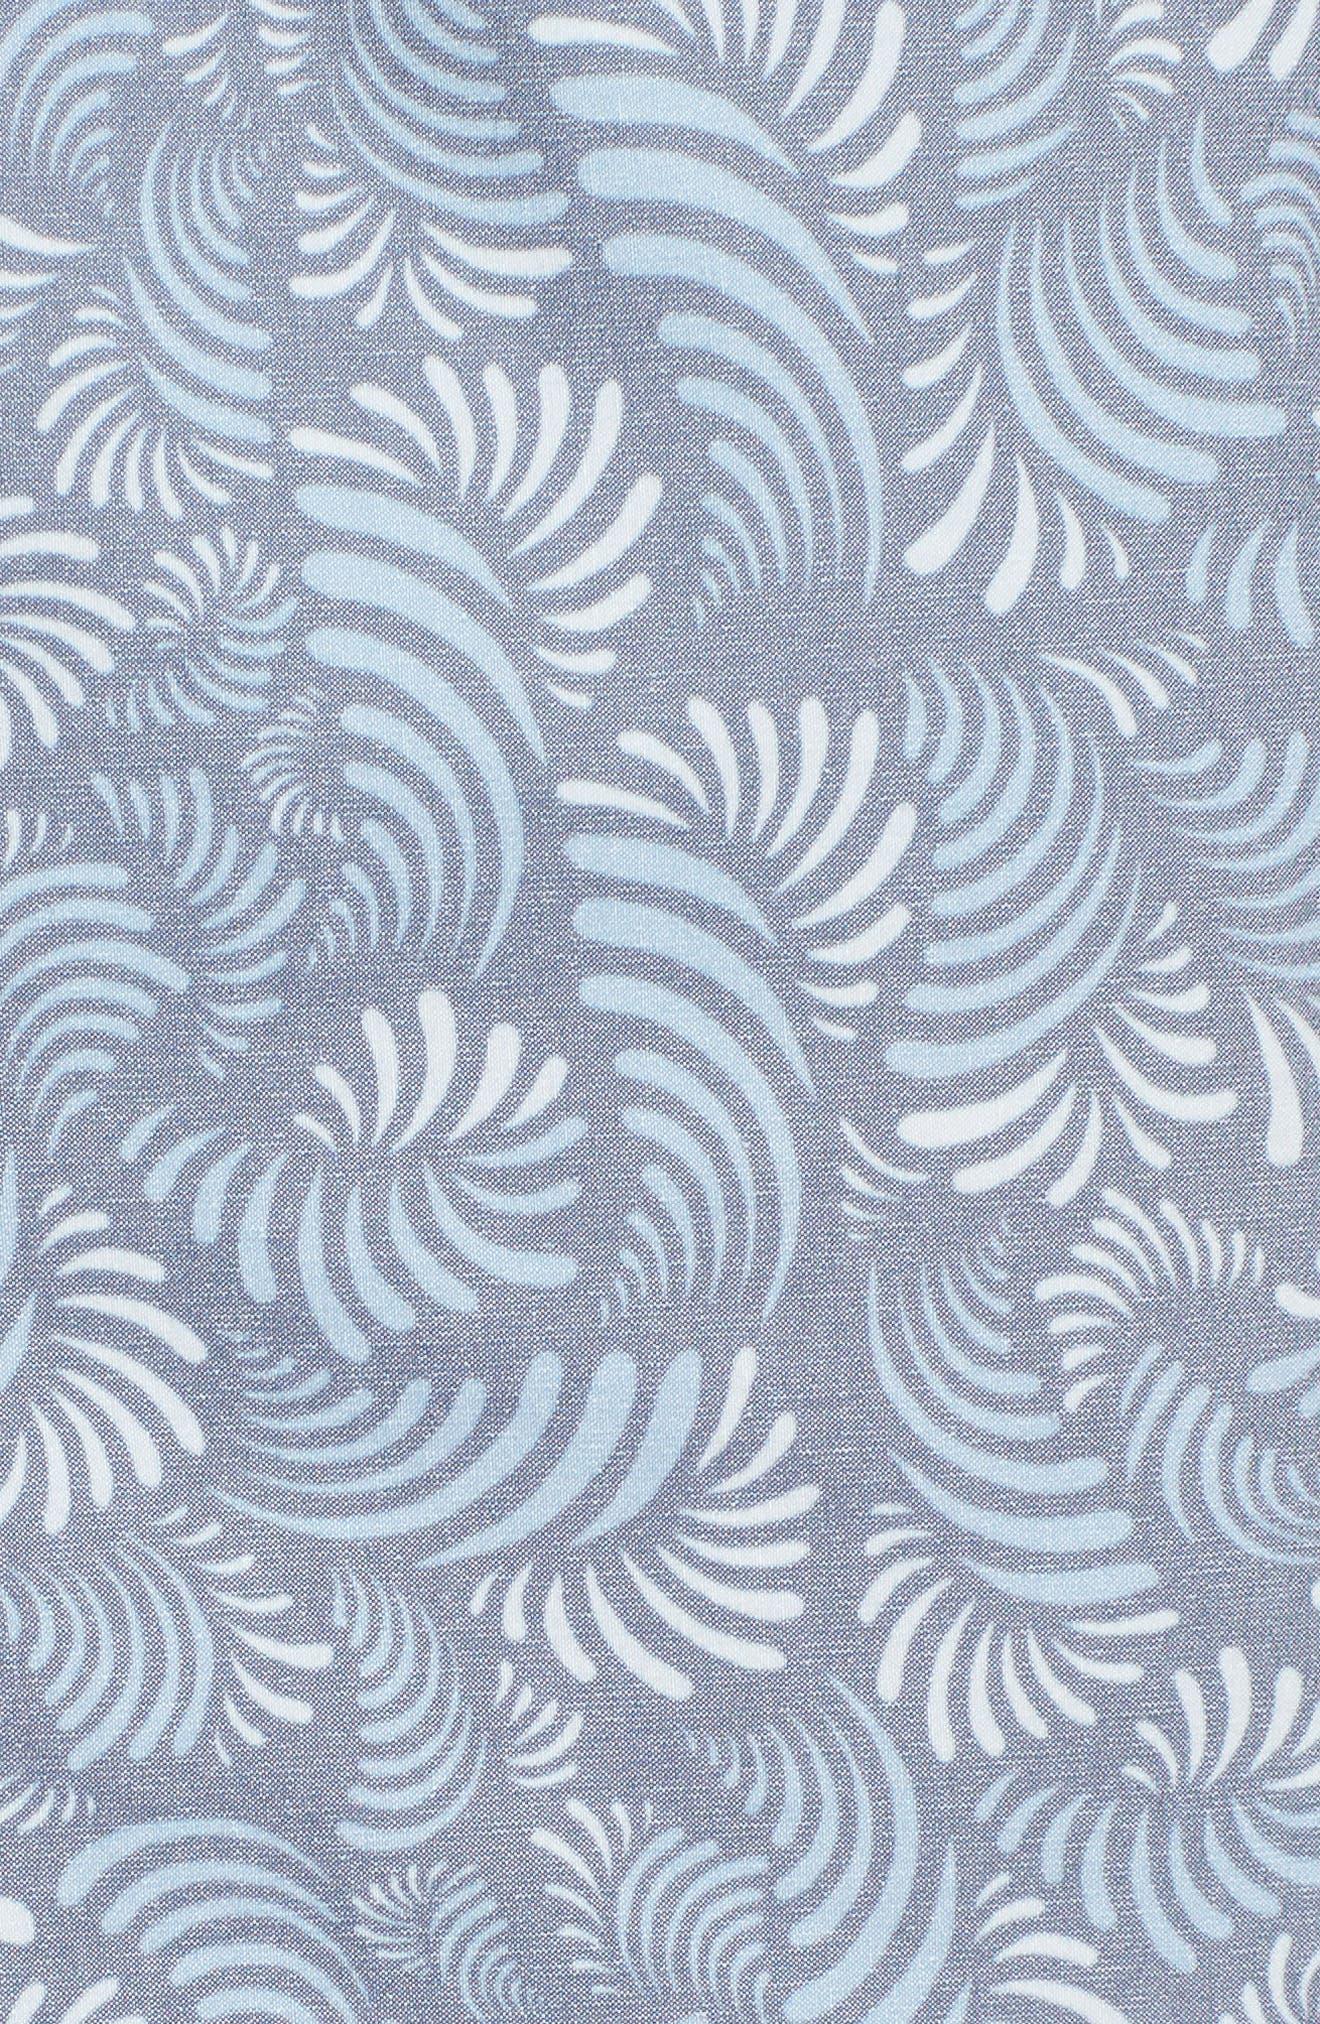 Seeker Board Shorts,                             Alternate thumbnail 5, color,                             LIGHT PINK/ BLUE